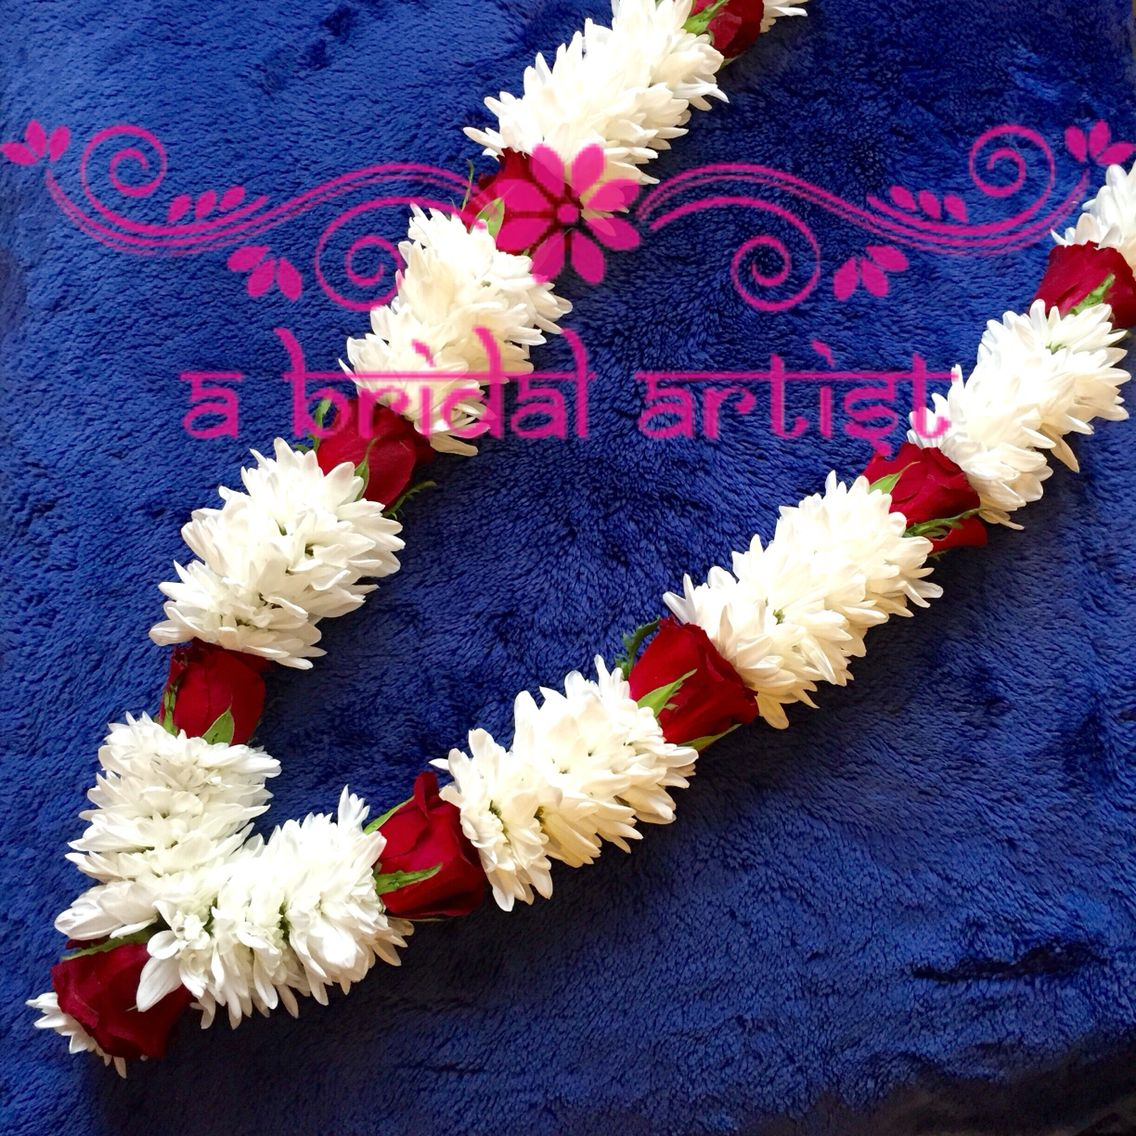 Exquisite Designer Wedding Garland Jaimala Haar Varmala Made From Fresh Flowers To Place Your Order Call 07872 482730